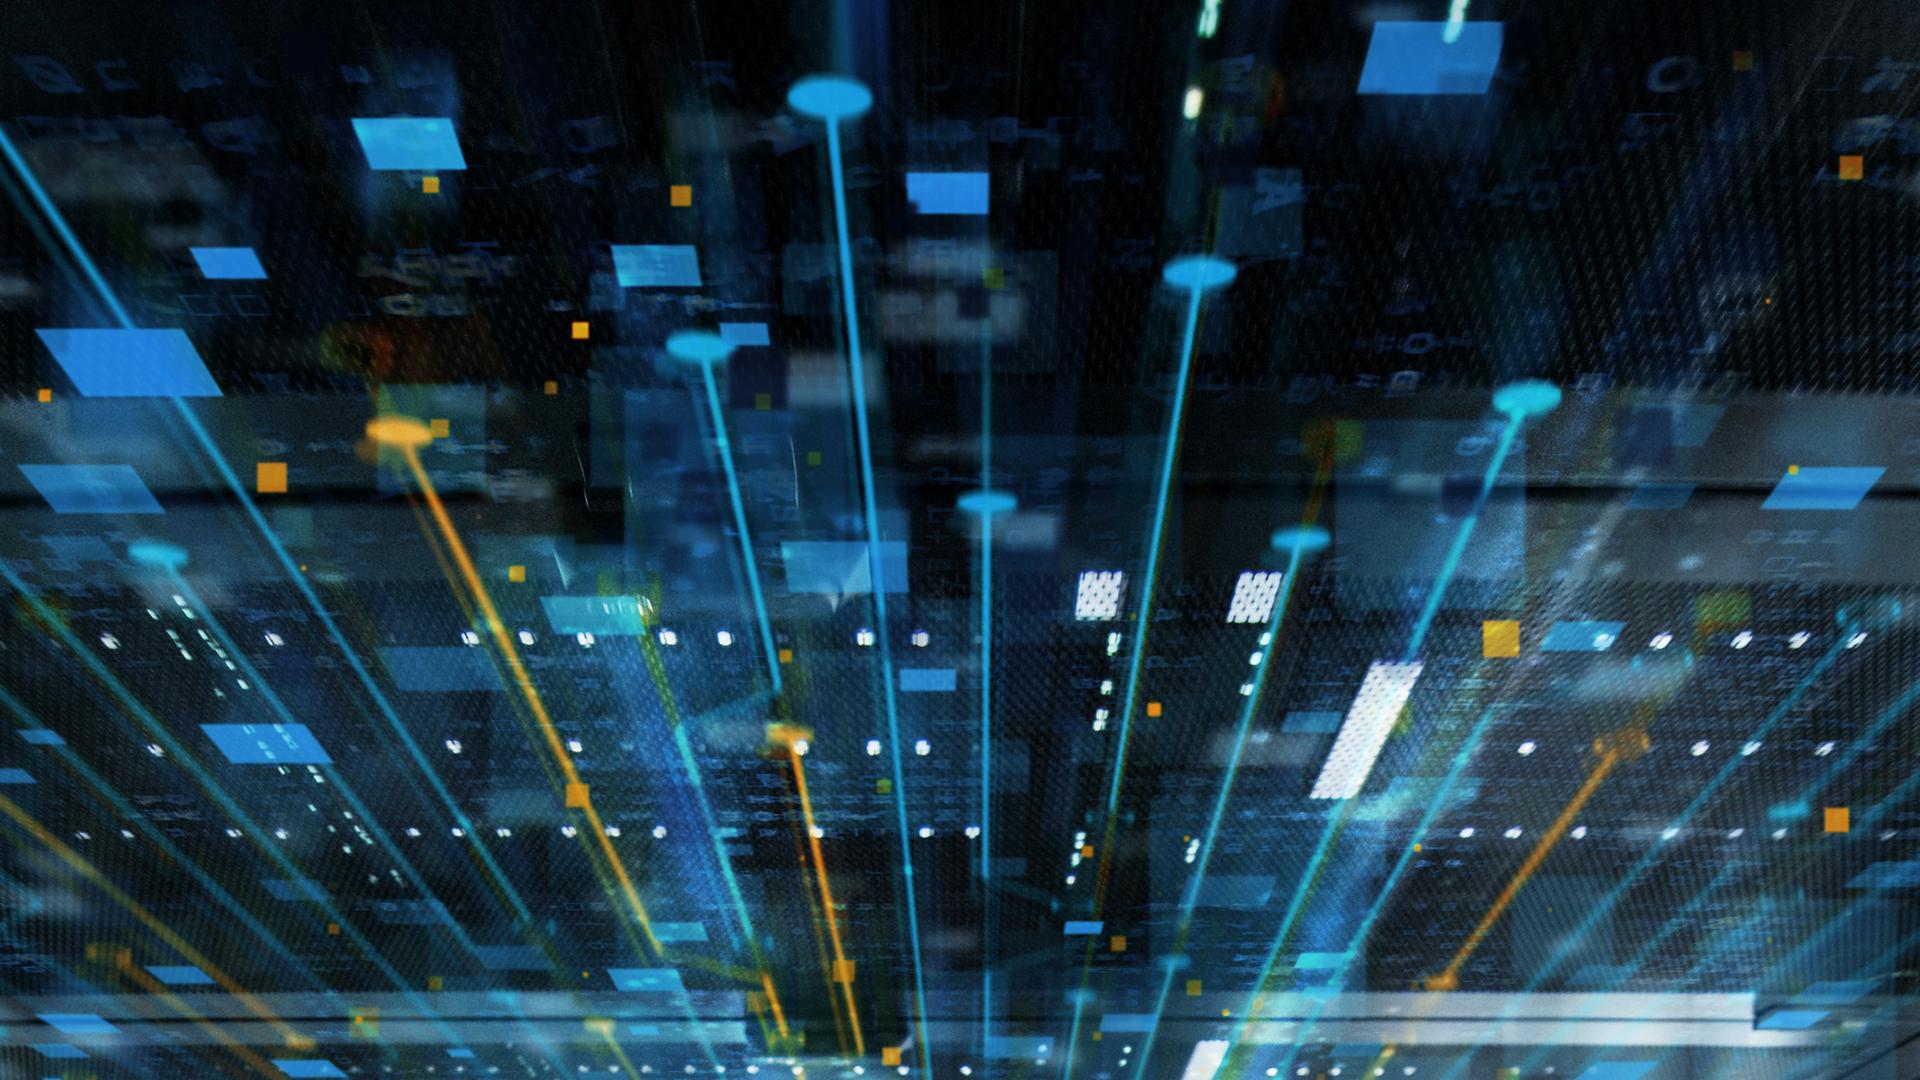 Artificial-intelligence-technology-network